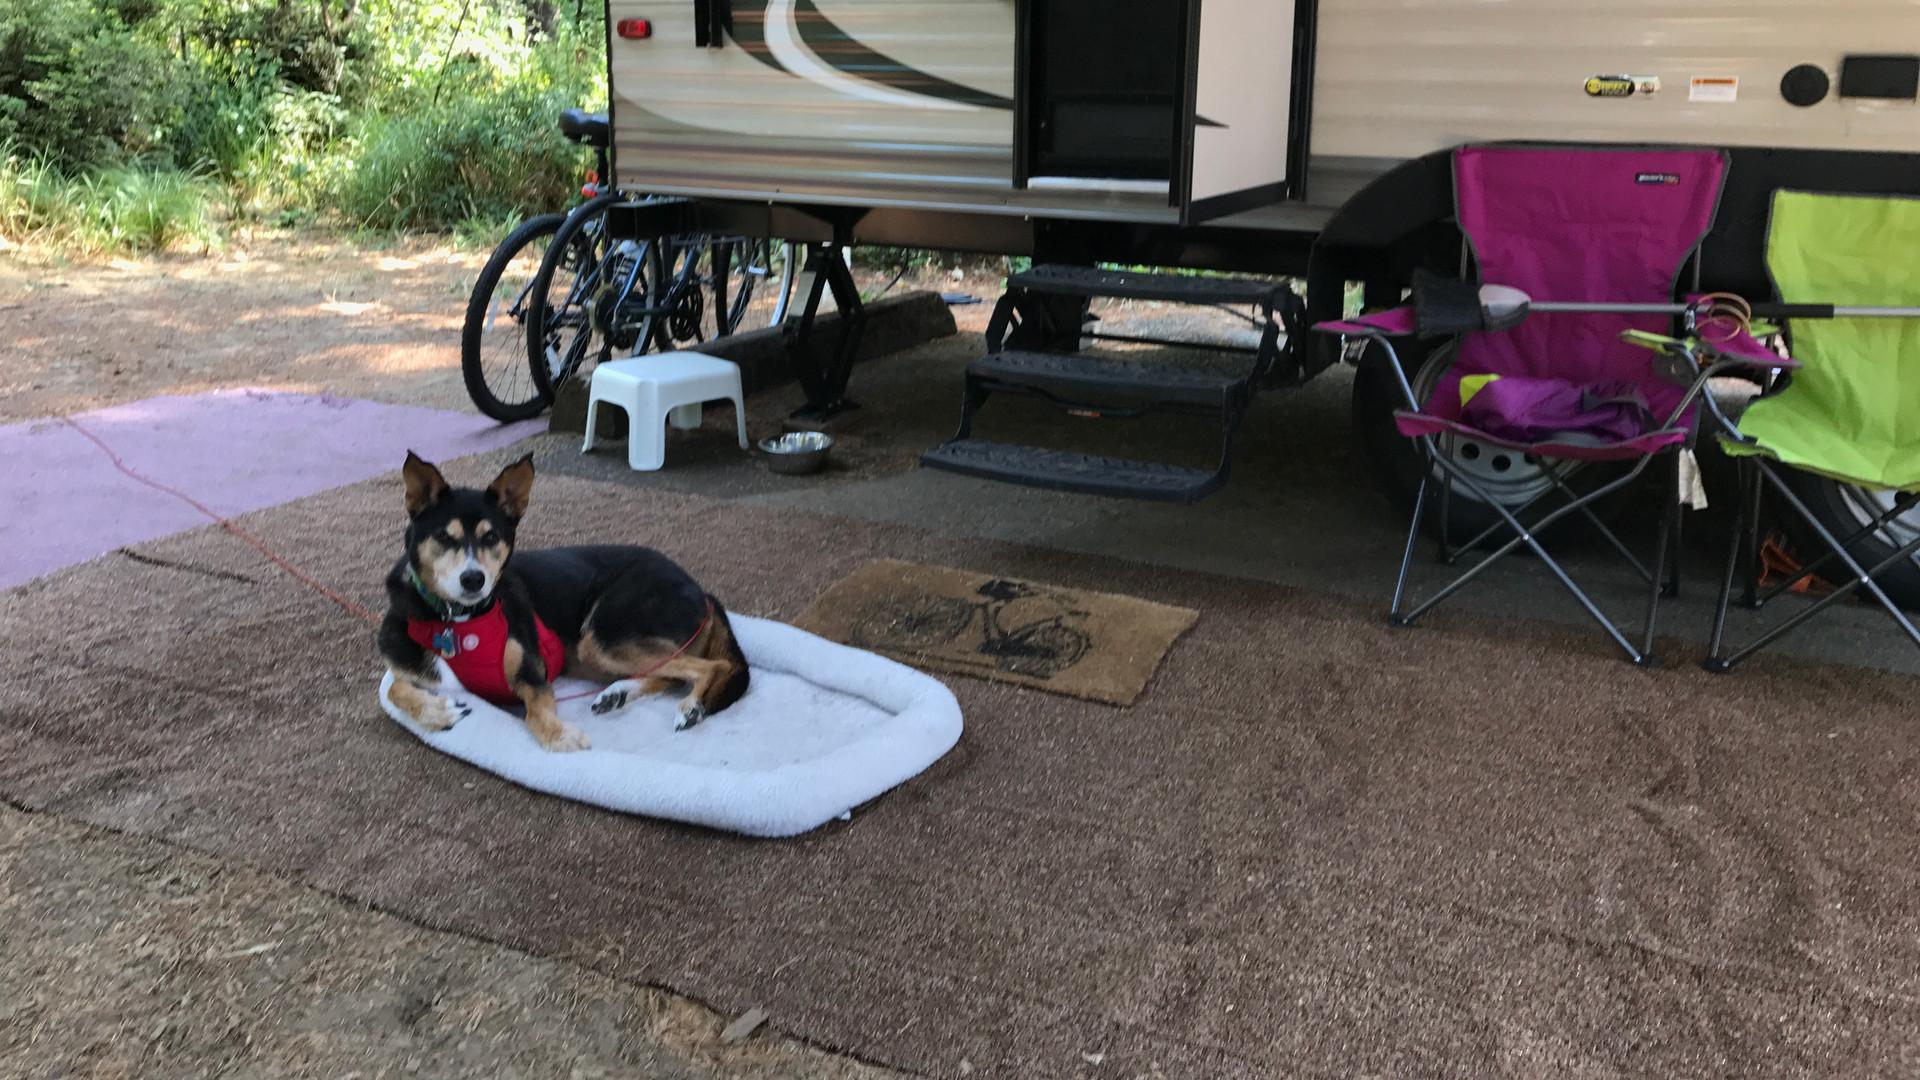 Emma the Incredible Camping Dog